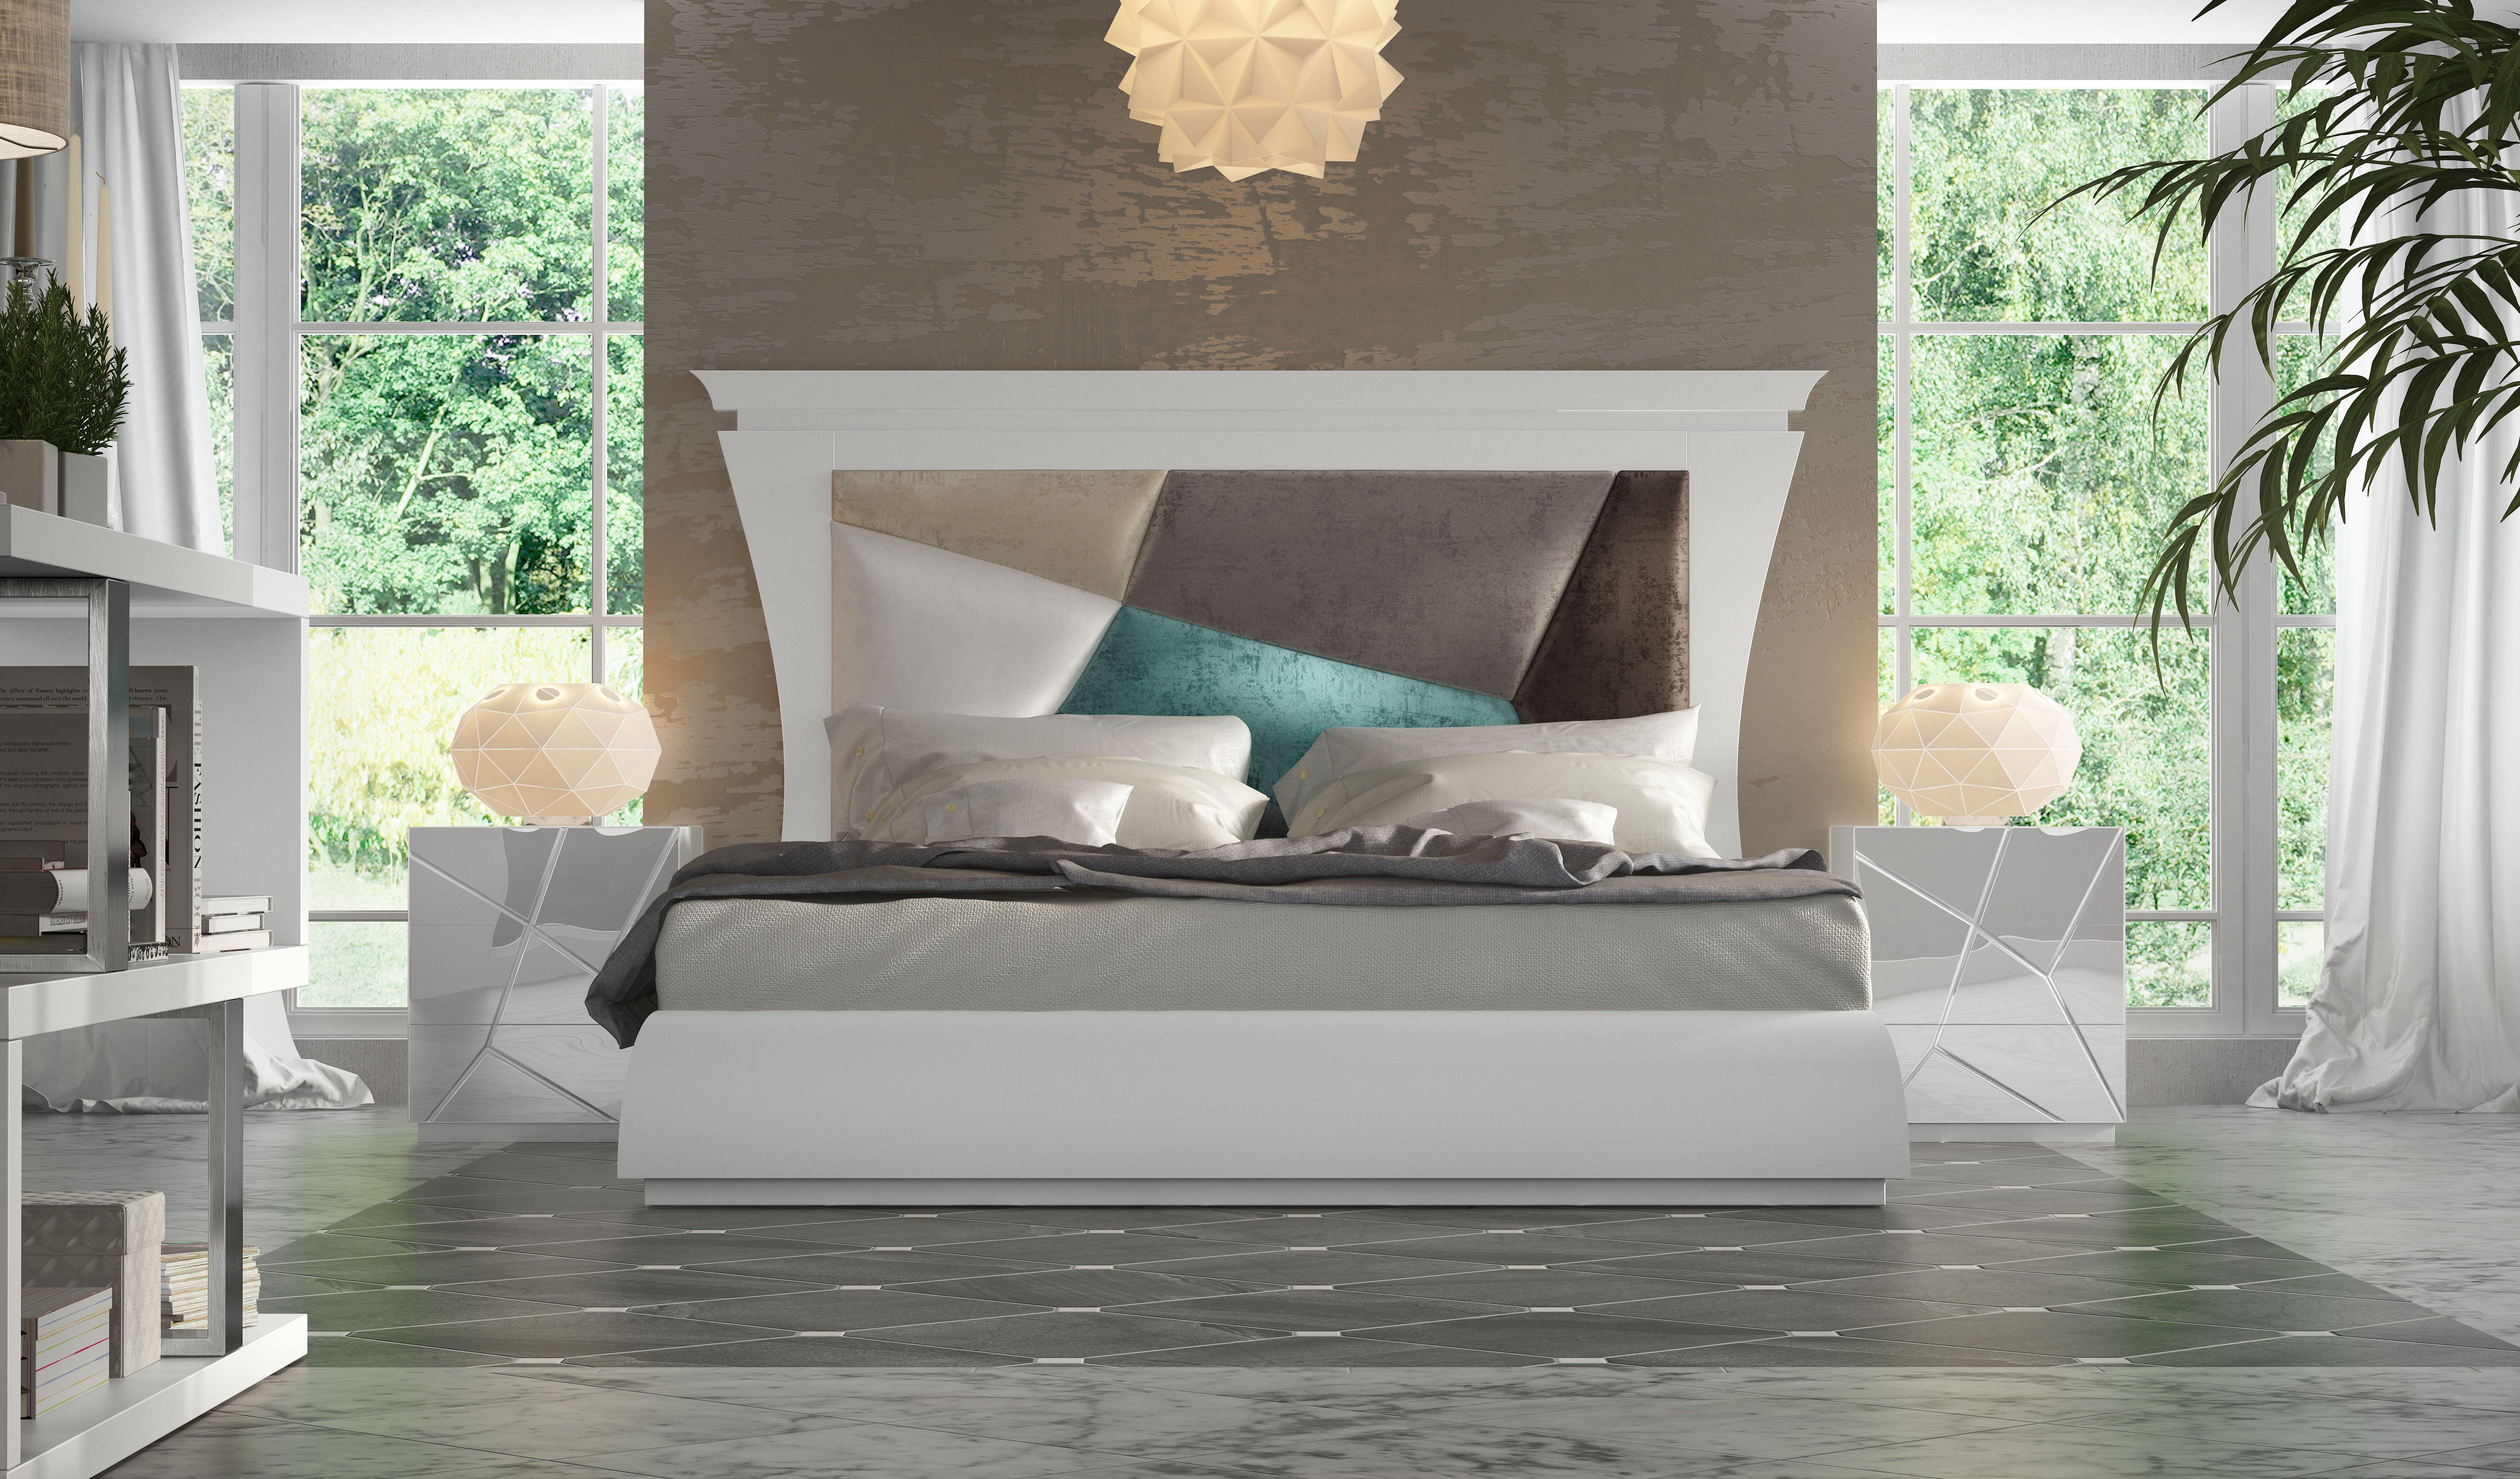 Lighted Headboard Bedroom Set Luxury Helotes King Standard 3 Piece Bedroom Set